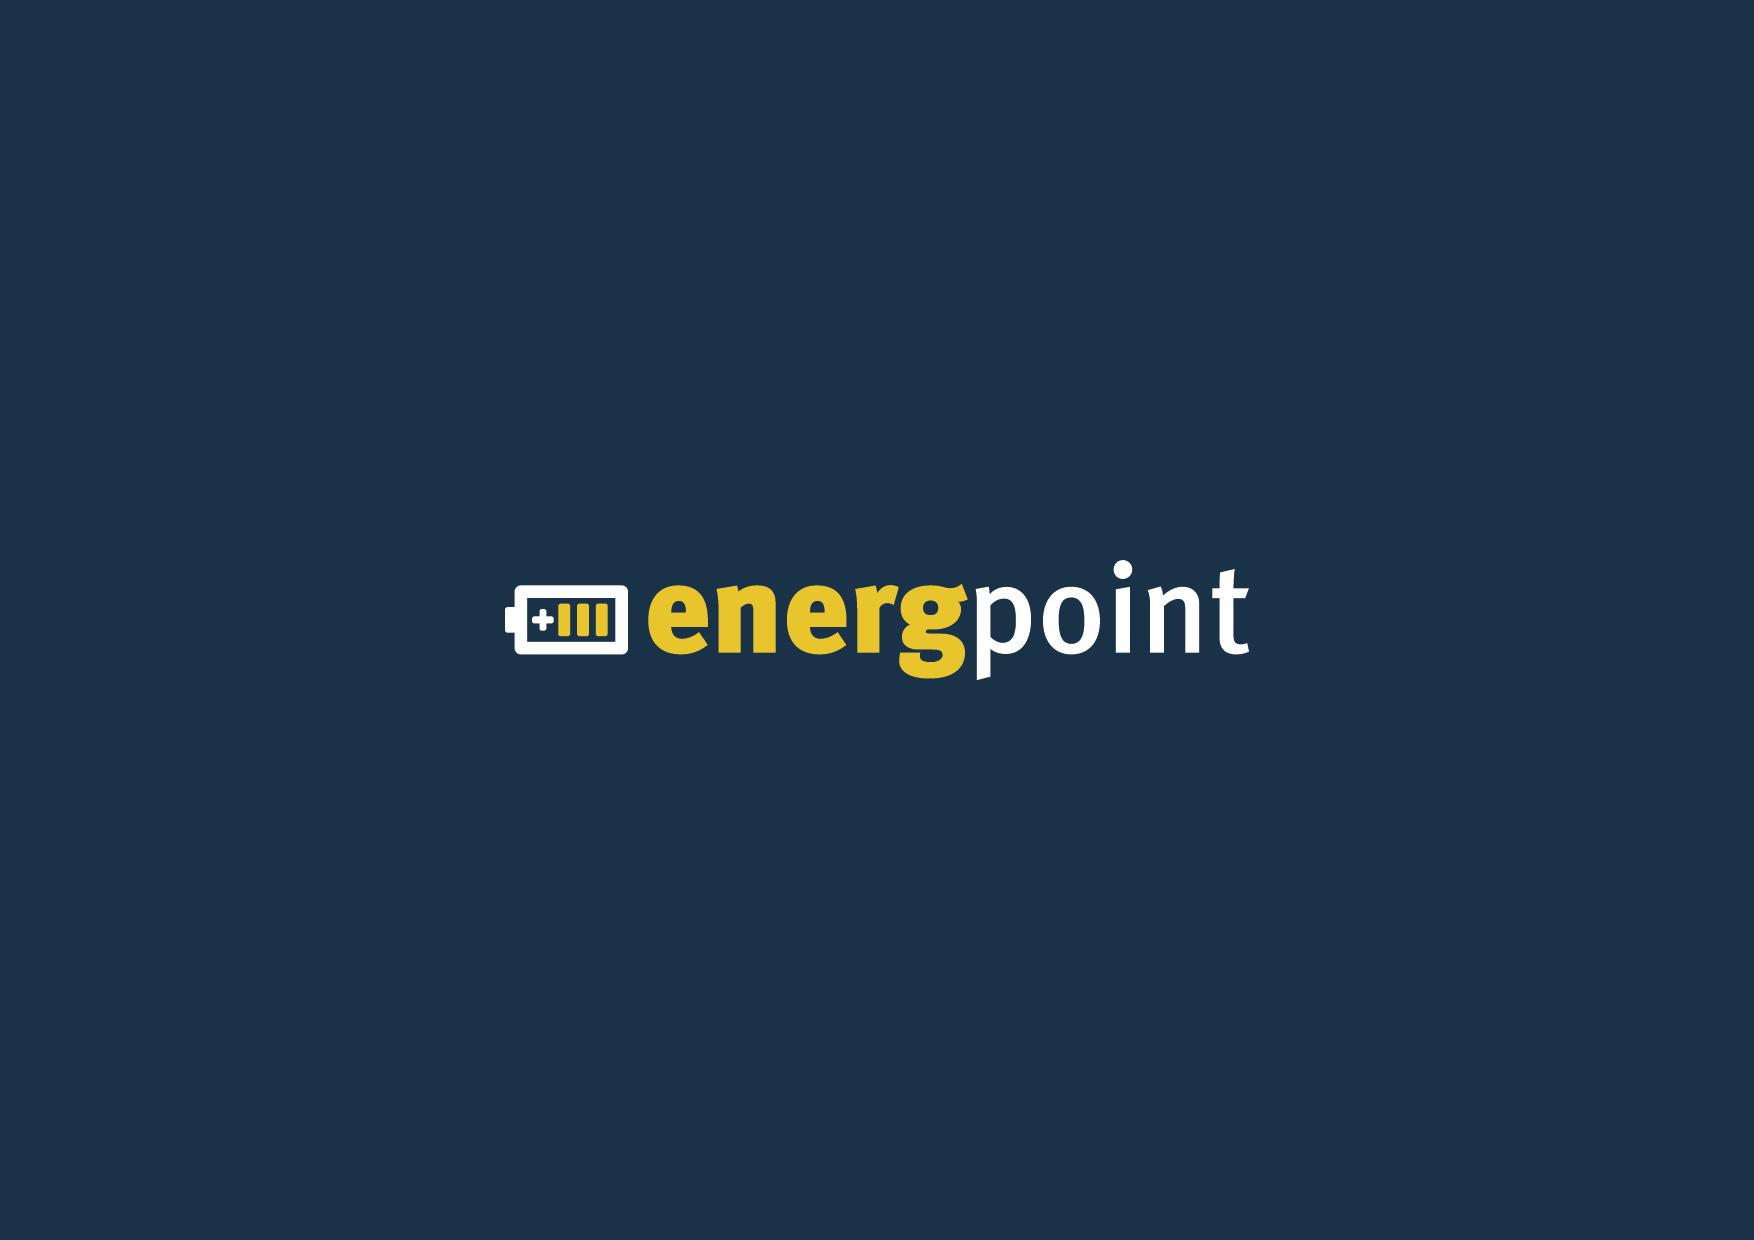 energ_point_logo-01